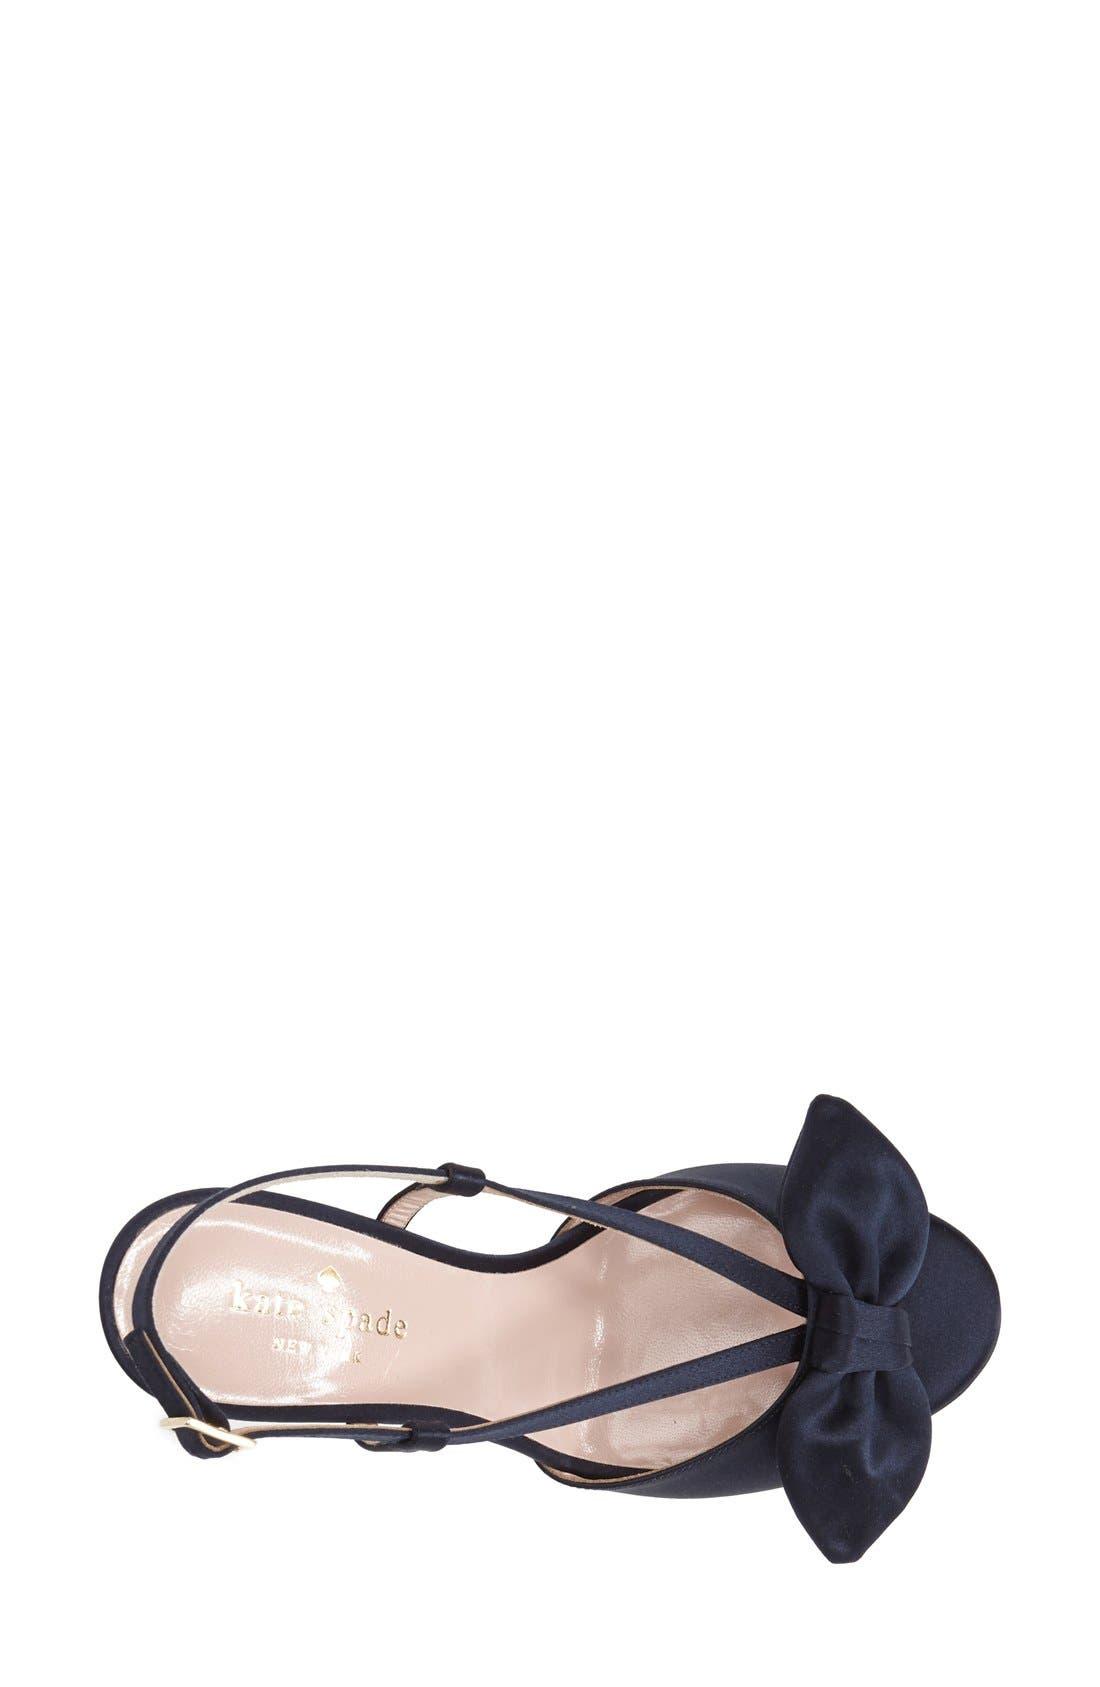 Alternate Image 3  - kate spade new york 'rezza' platform sandal (Women)